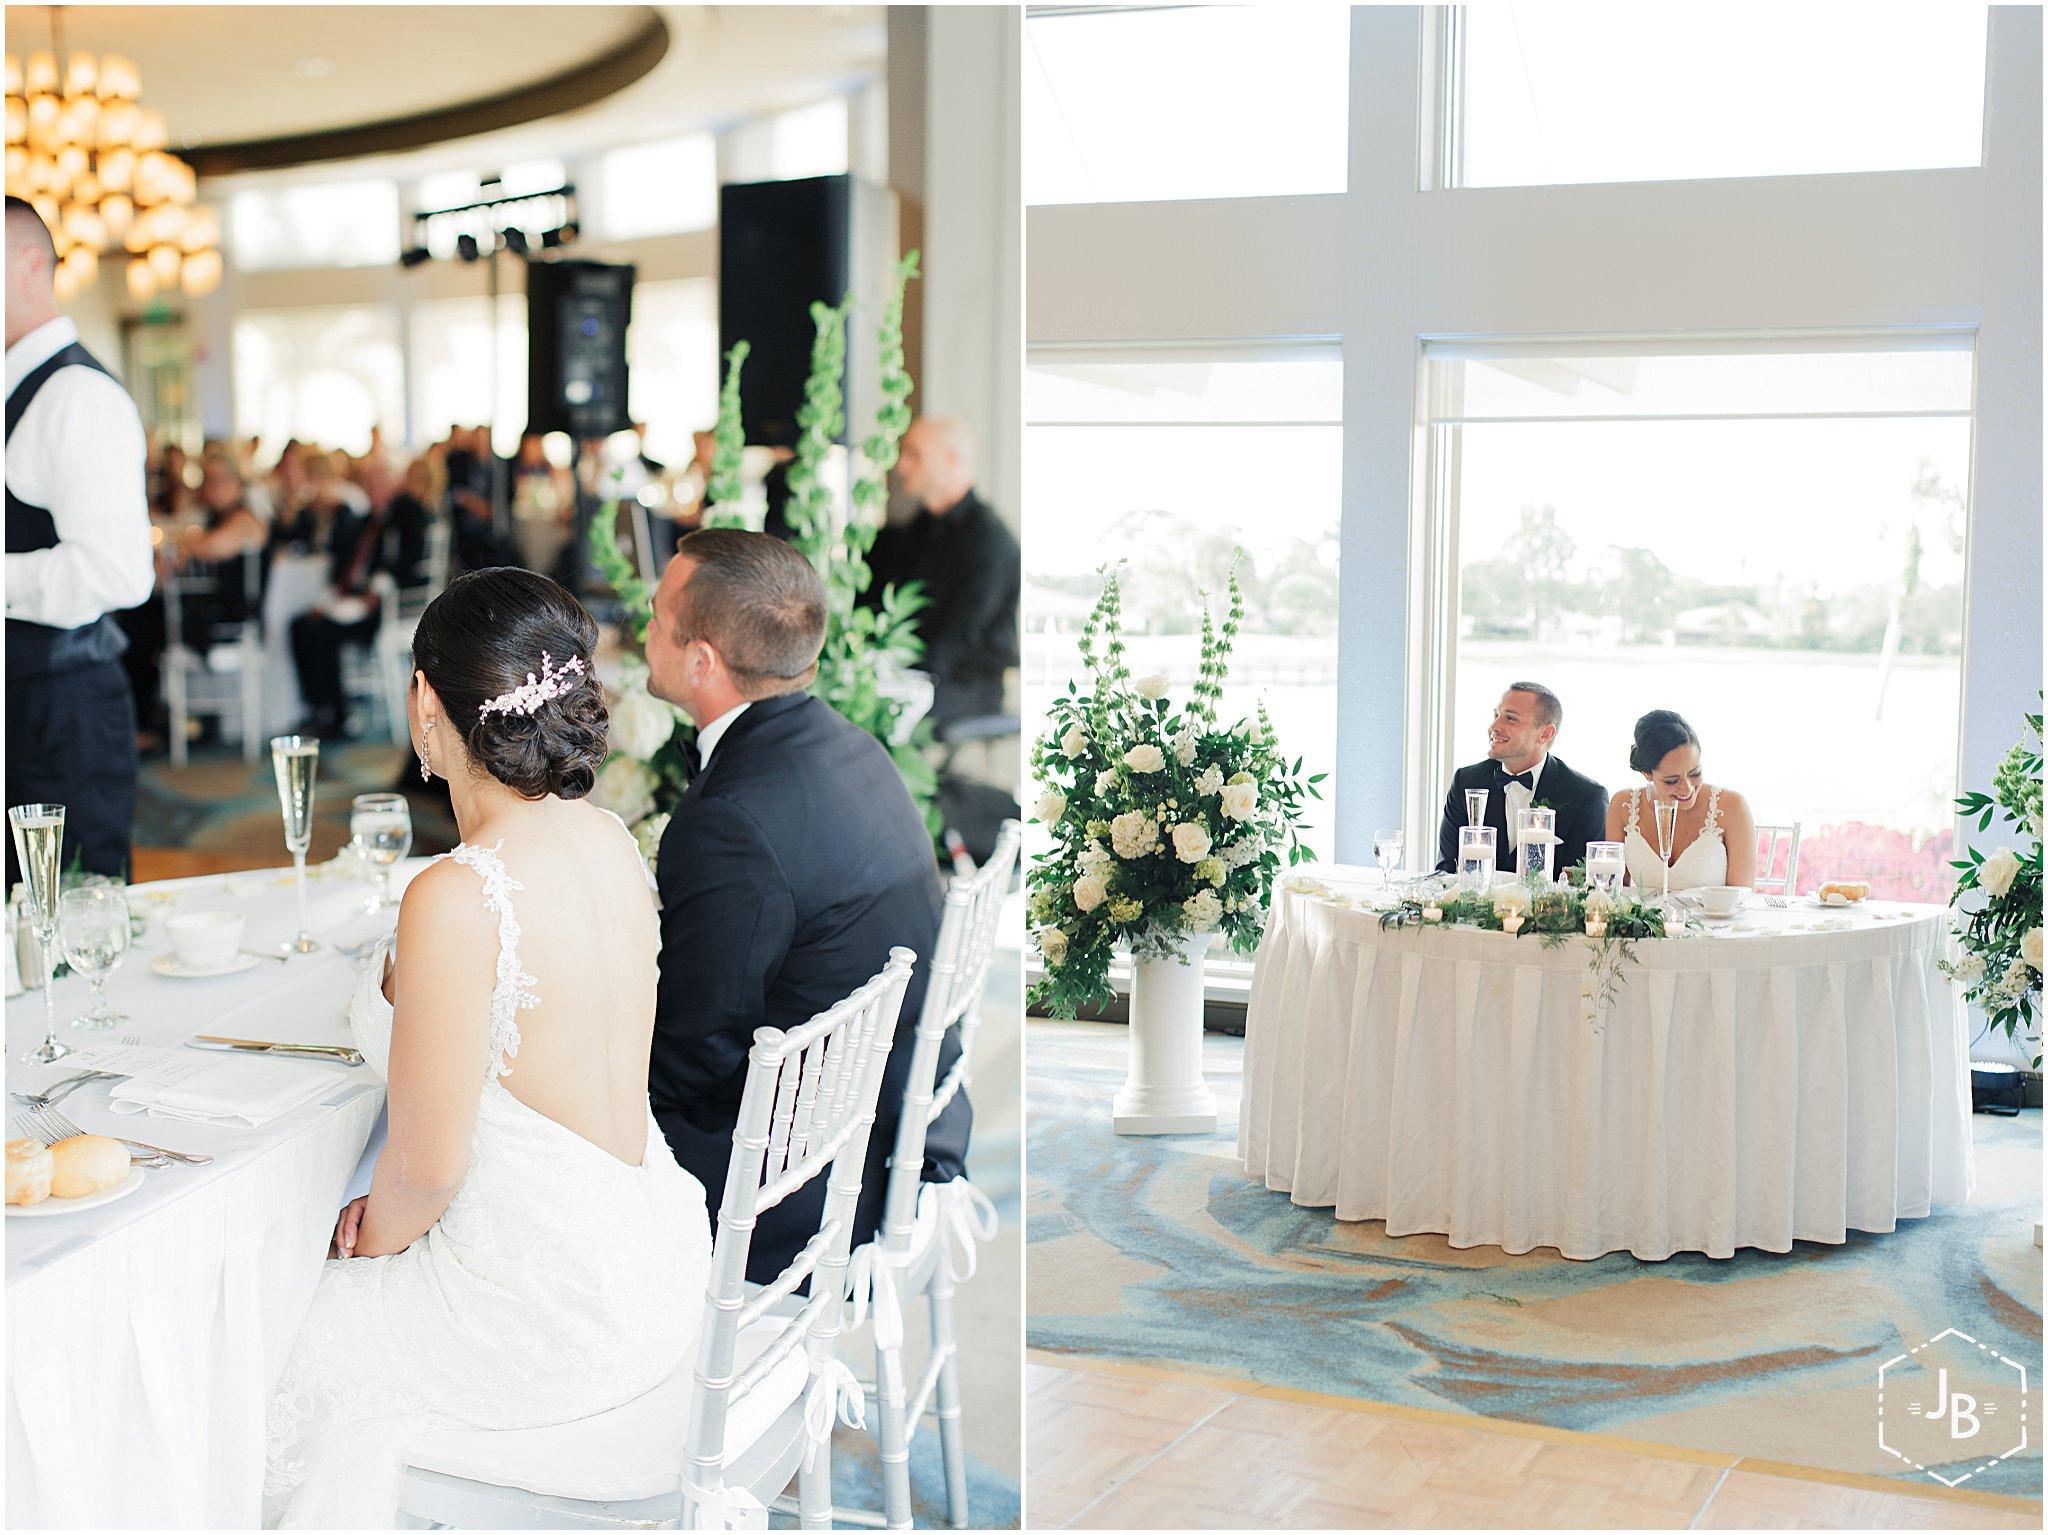 WeddingandEngagementFloridaPhotographer_0293.jpg